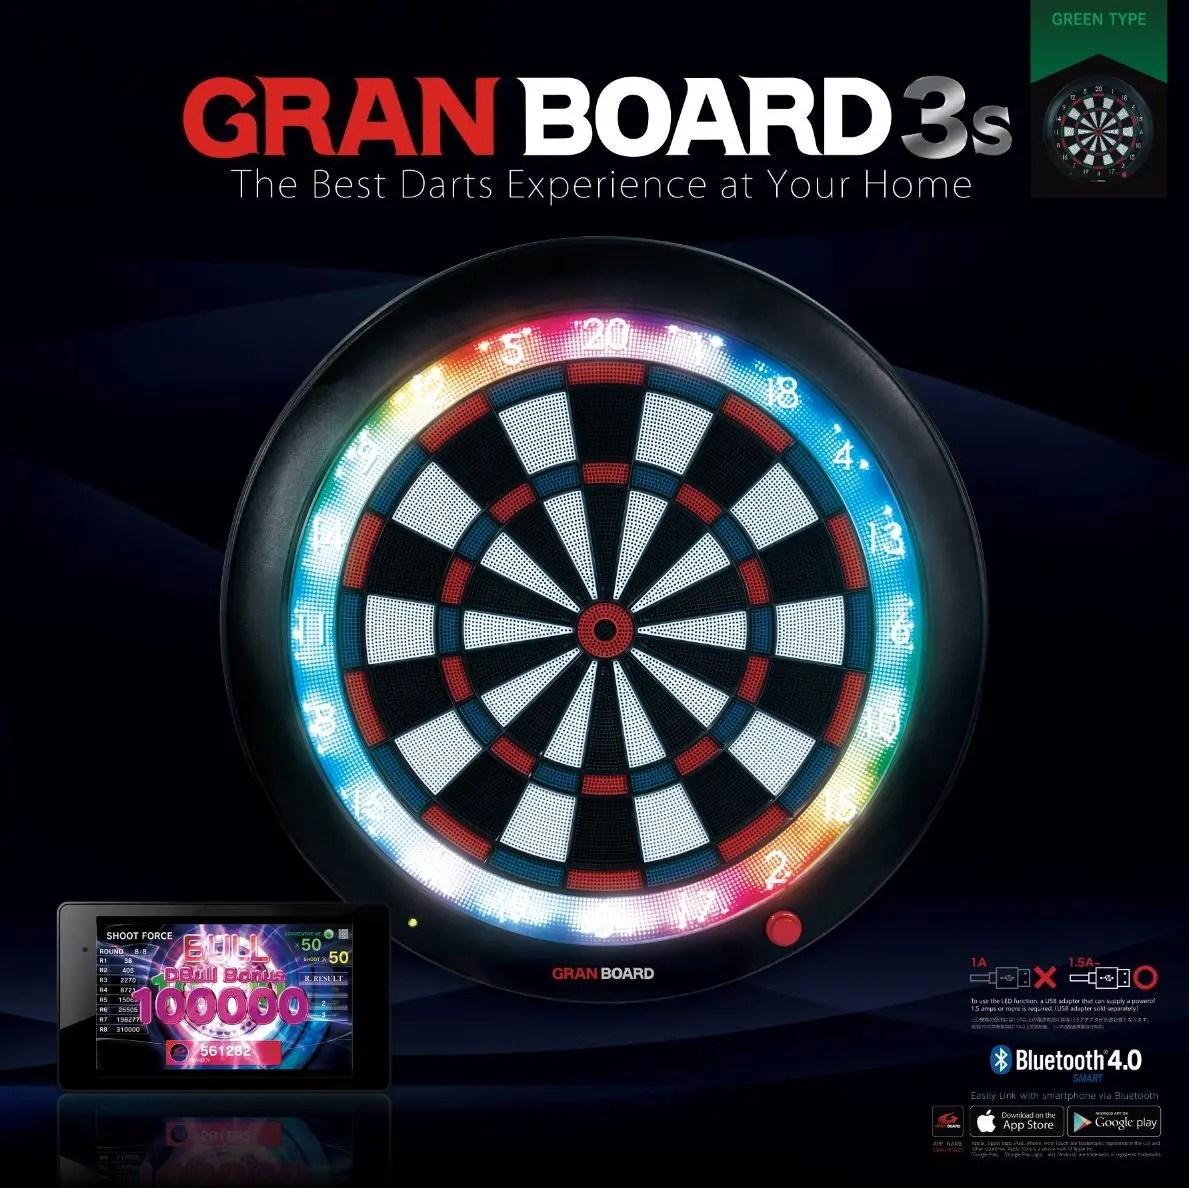 Gran Board 3s (green) box